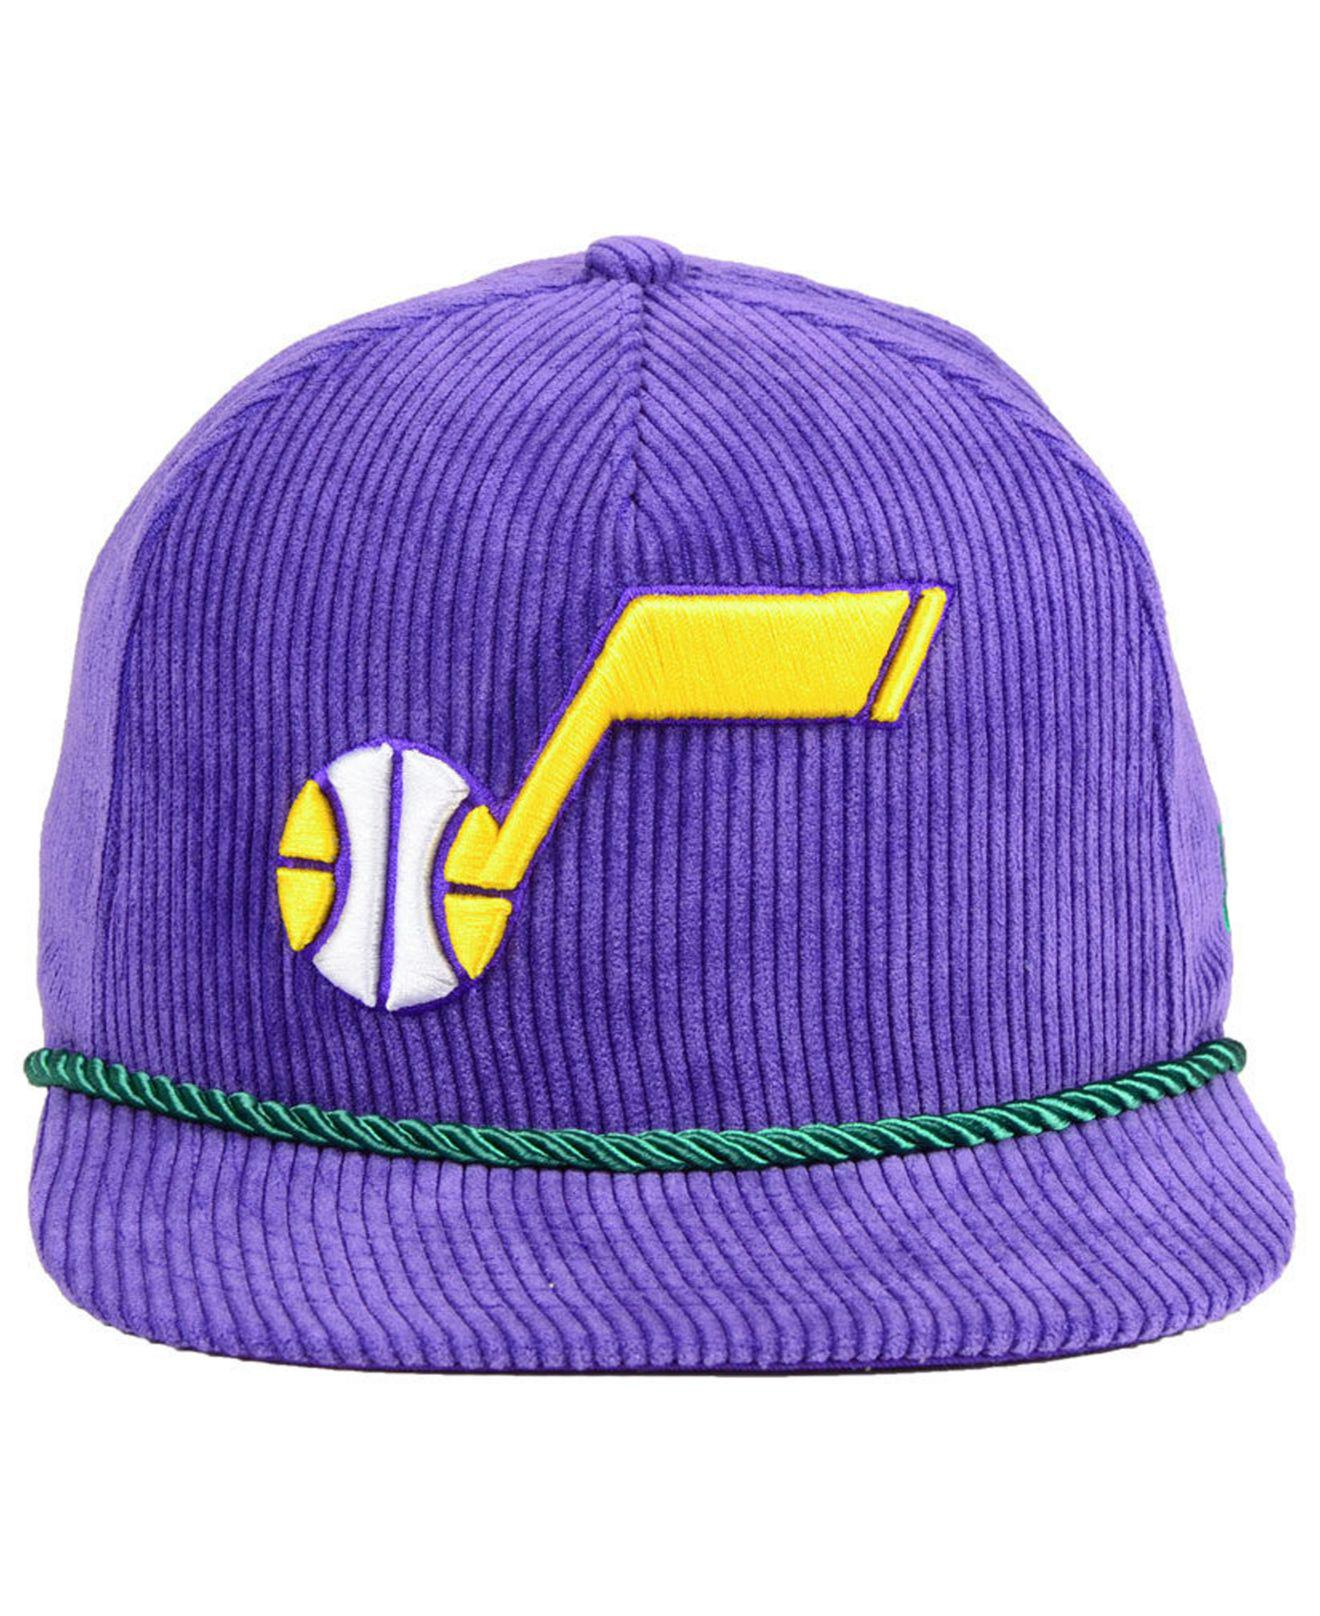 883cfeeb5 Lyst - KTZ Utah Jazz Hardwood Classic Nights Cords 9fifty Snapback Cap in  Purple for Men